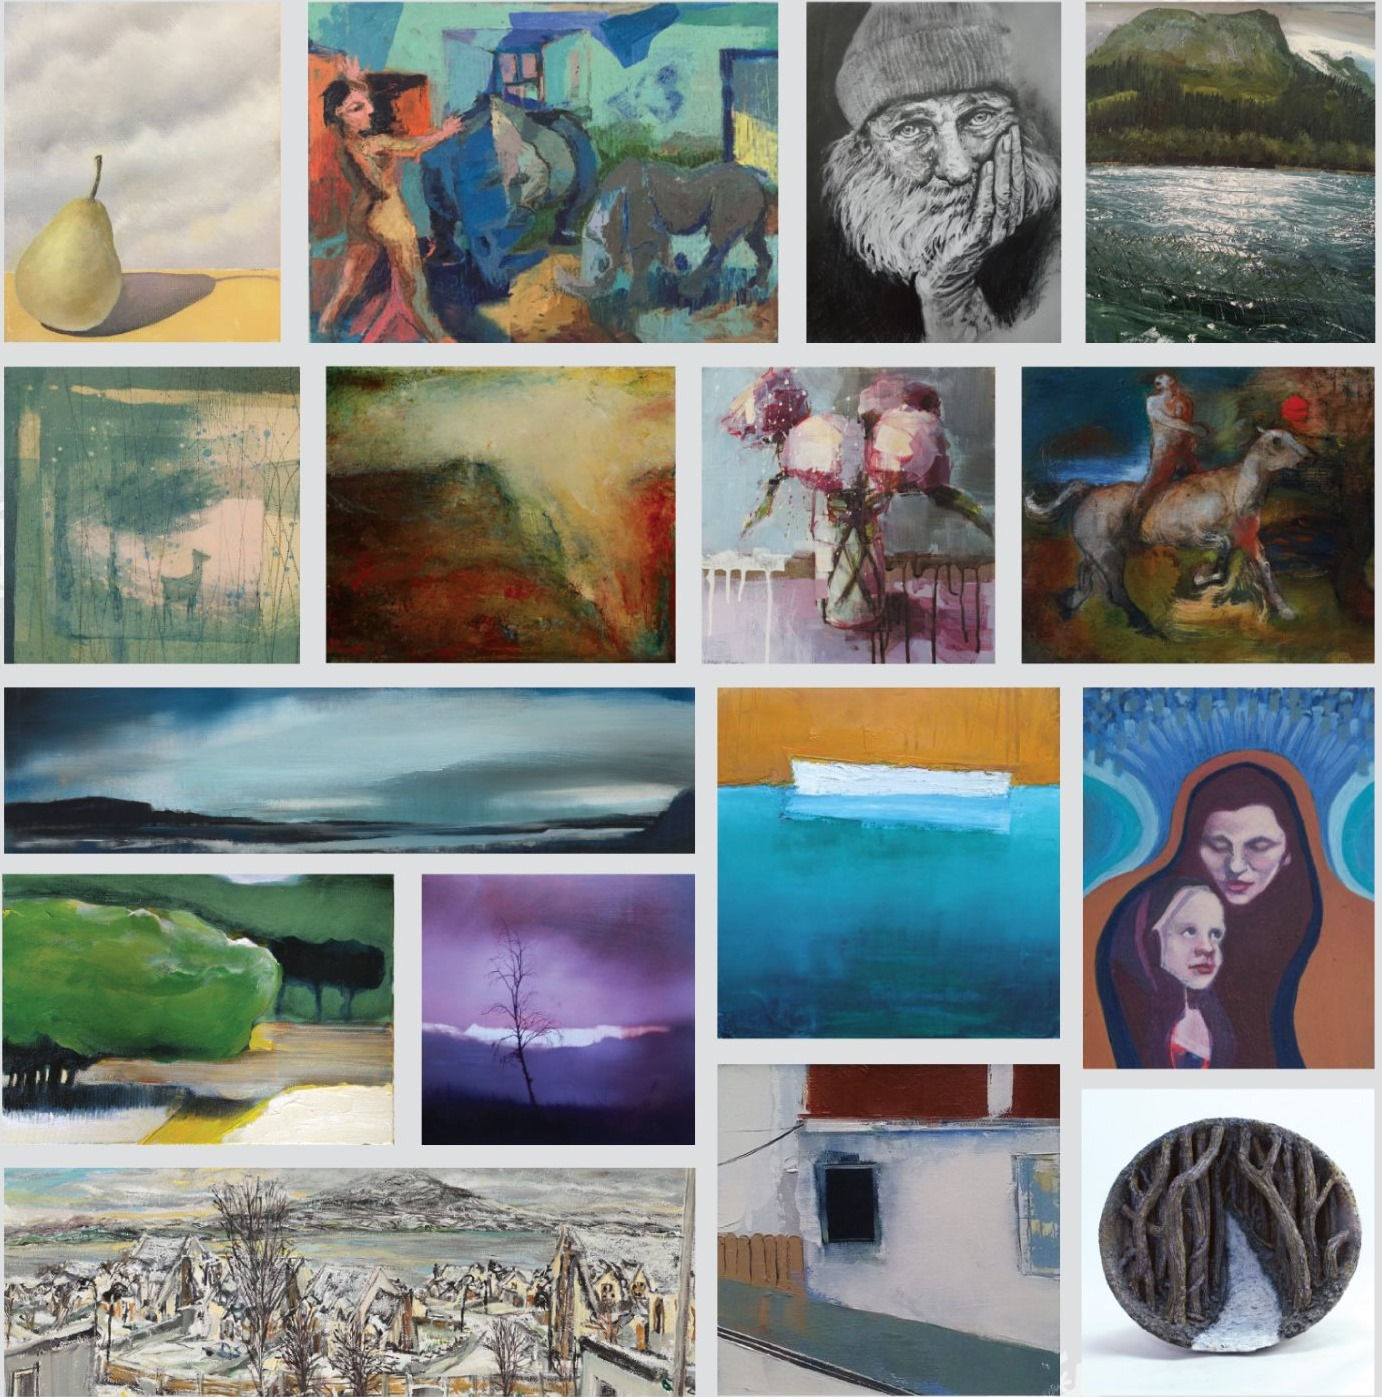 Hamilton Gallery 2016 Invited Artists Exhibition Collage.